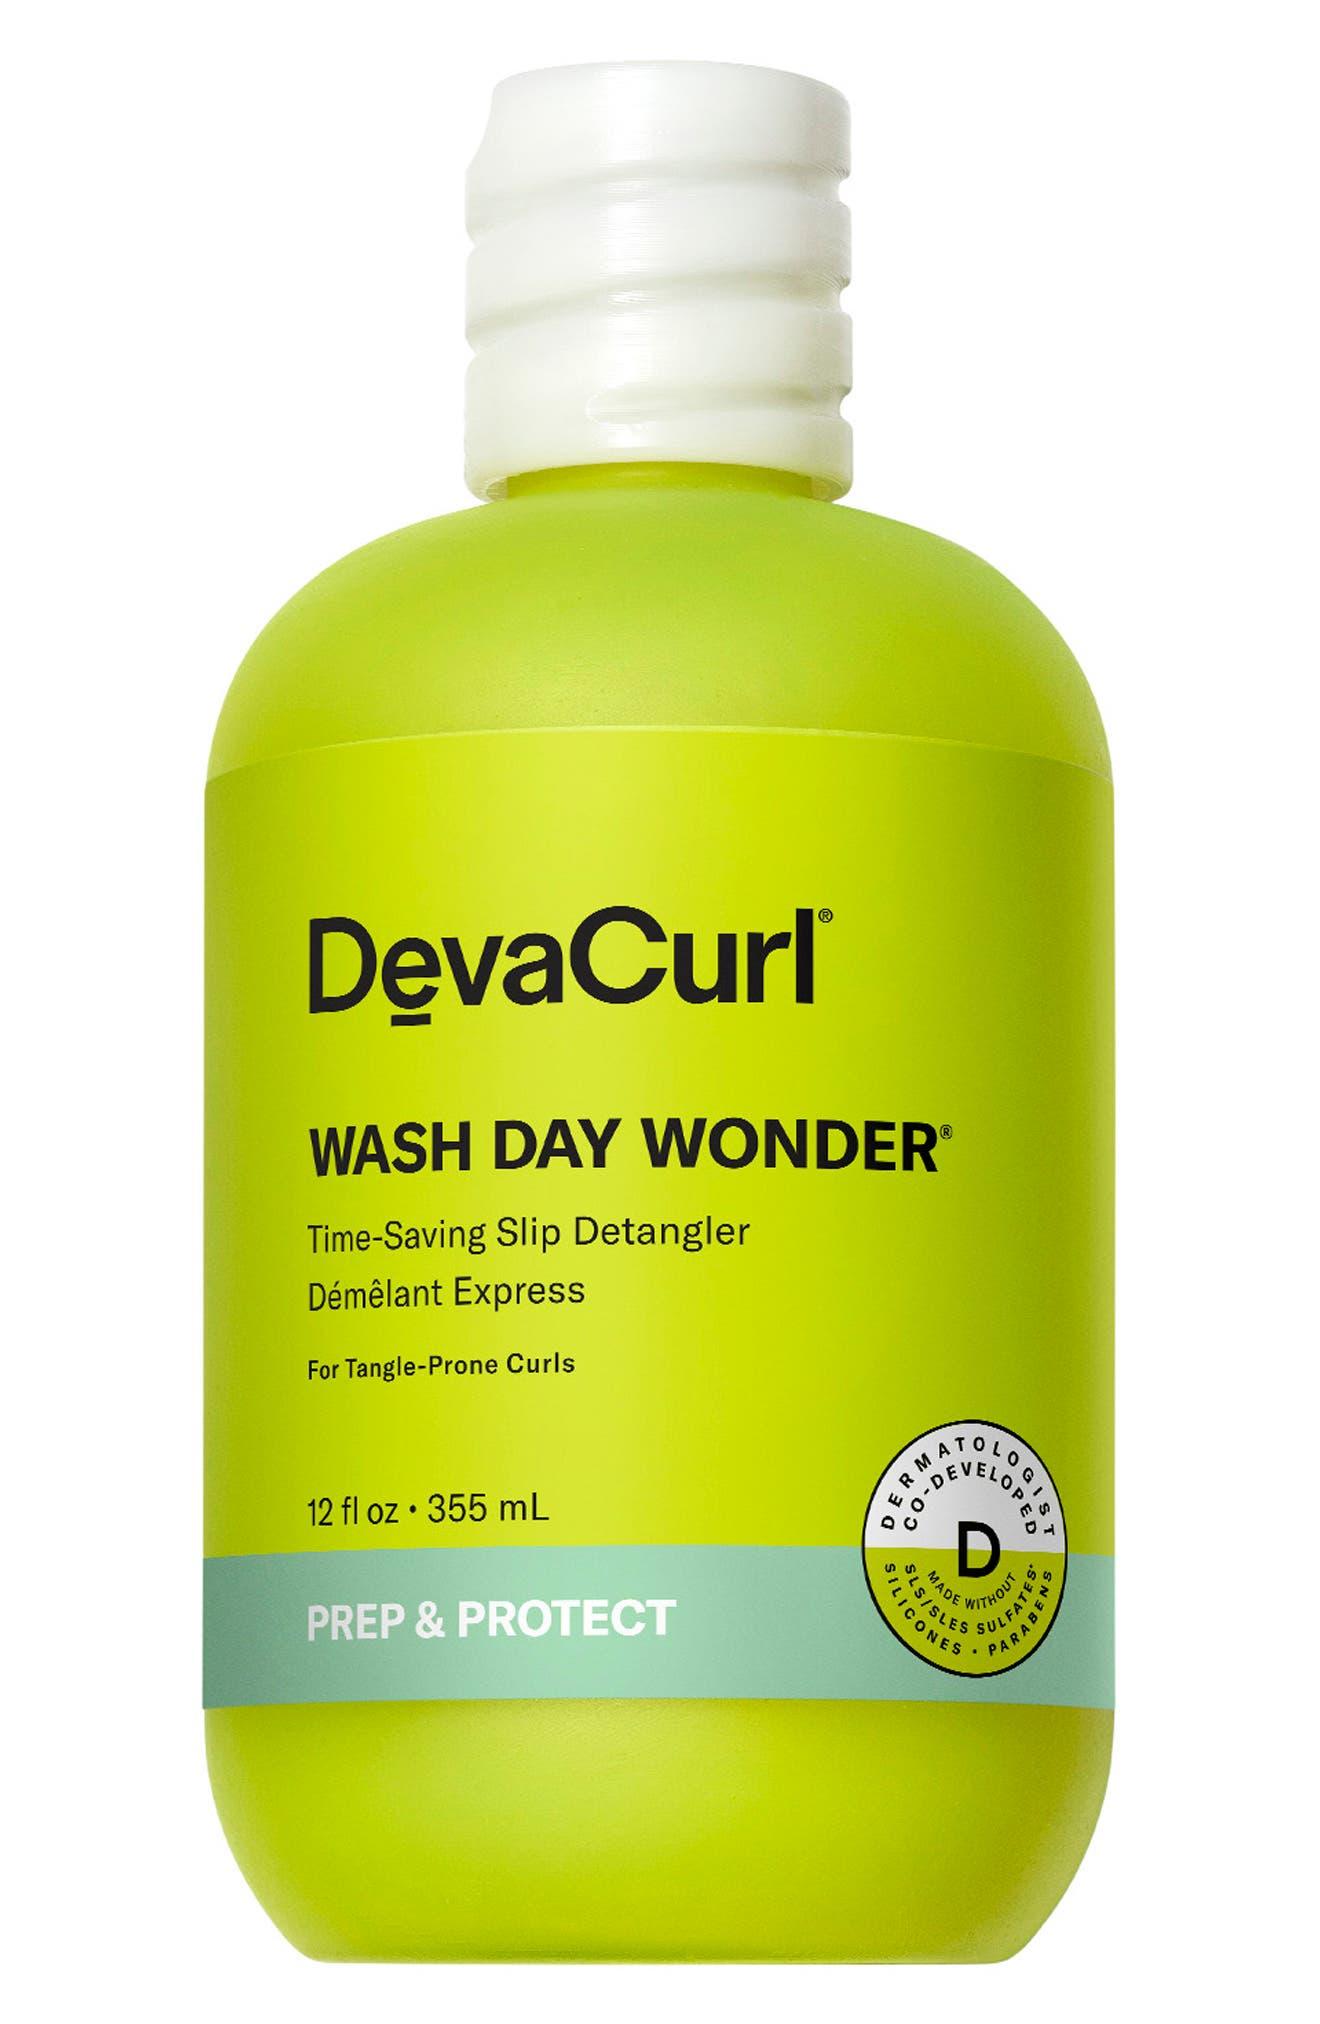 DevaCurl Wash Day Wonder(R) Time-Saving Slip Detangler